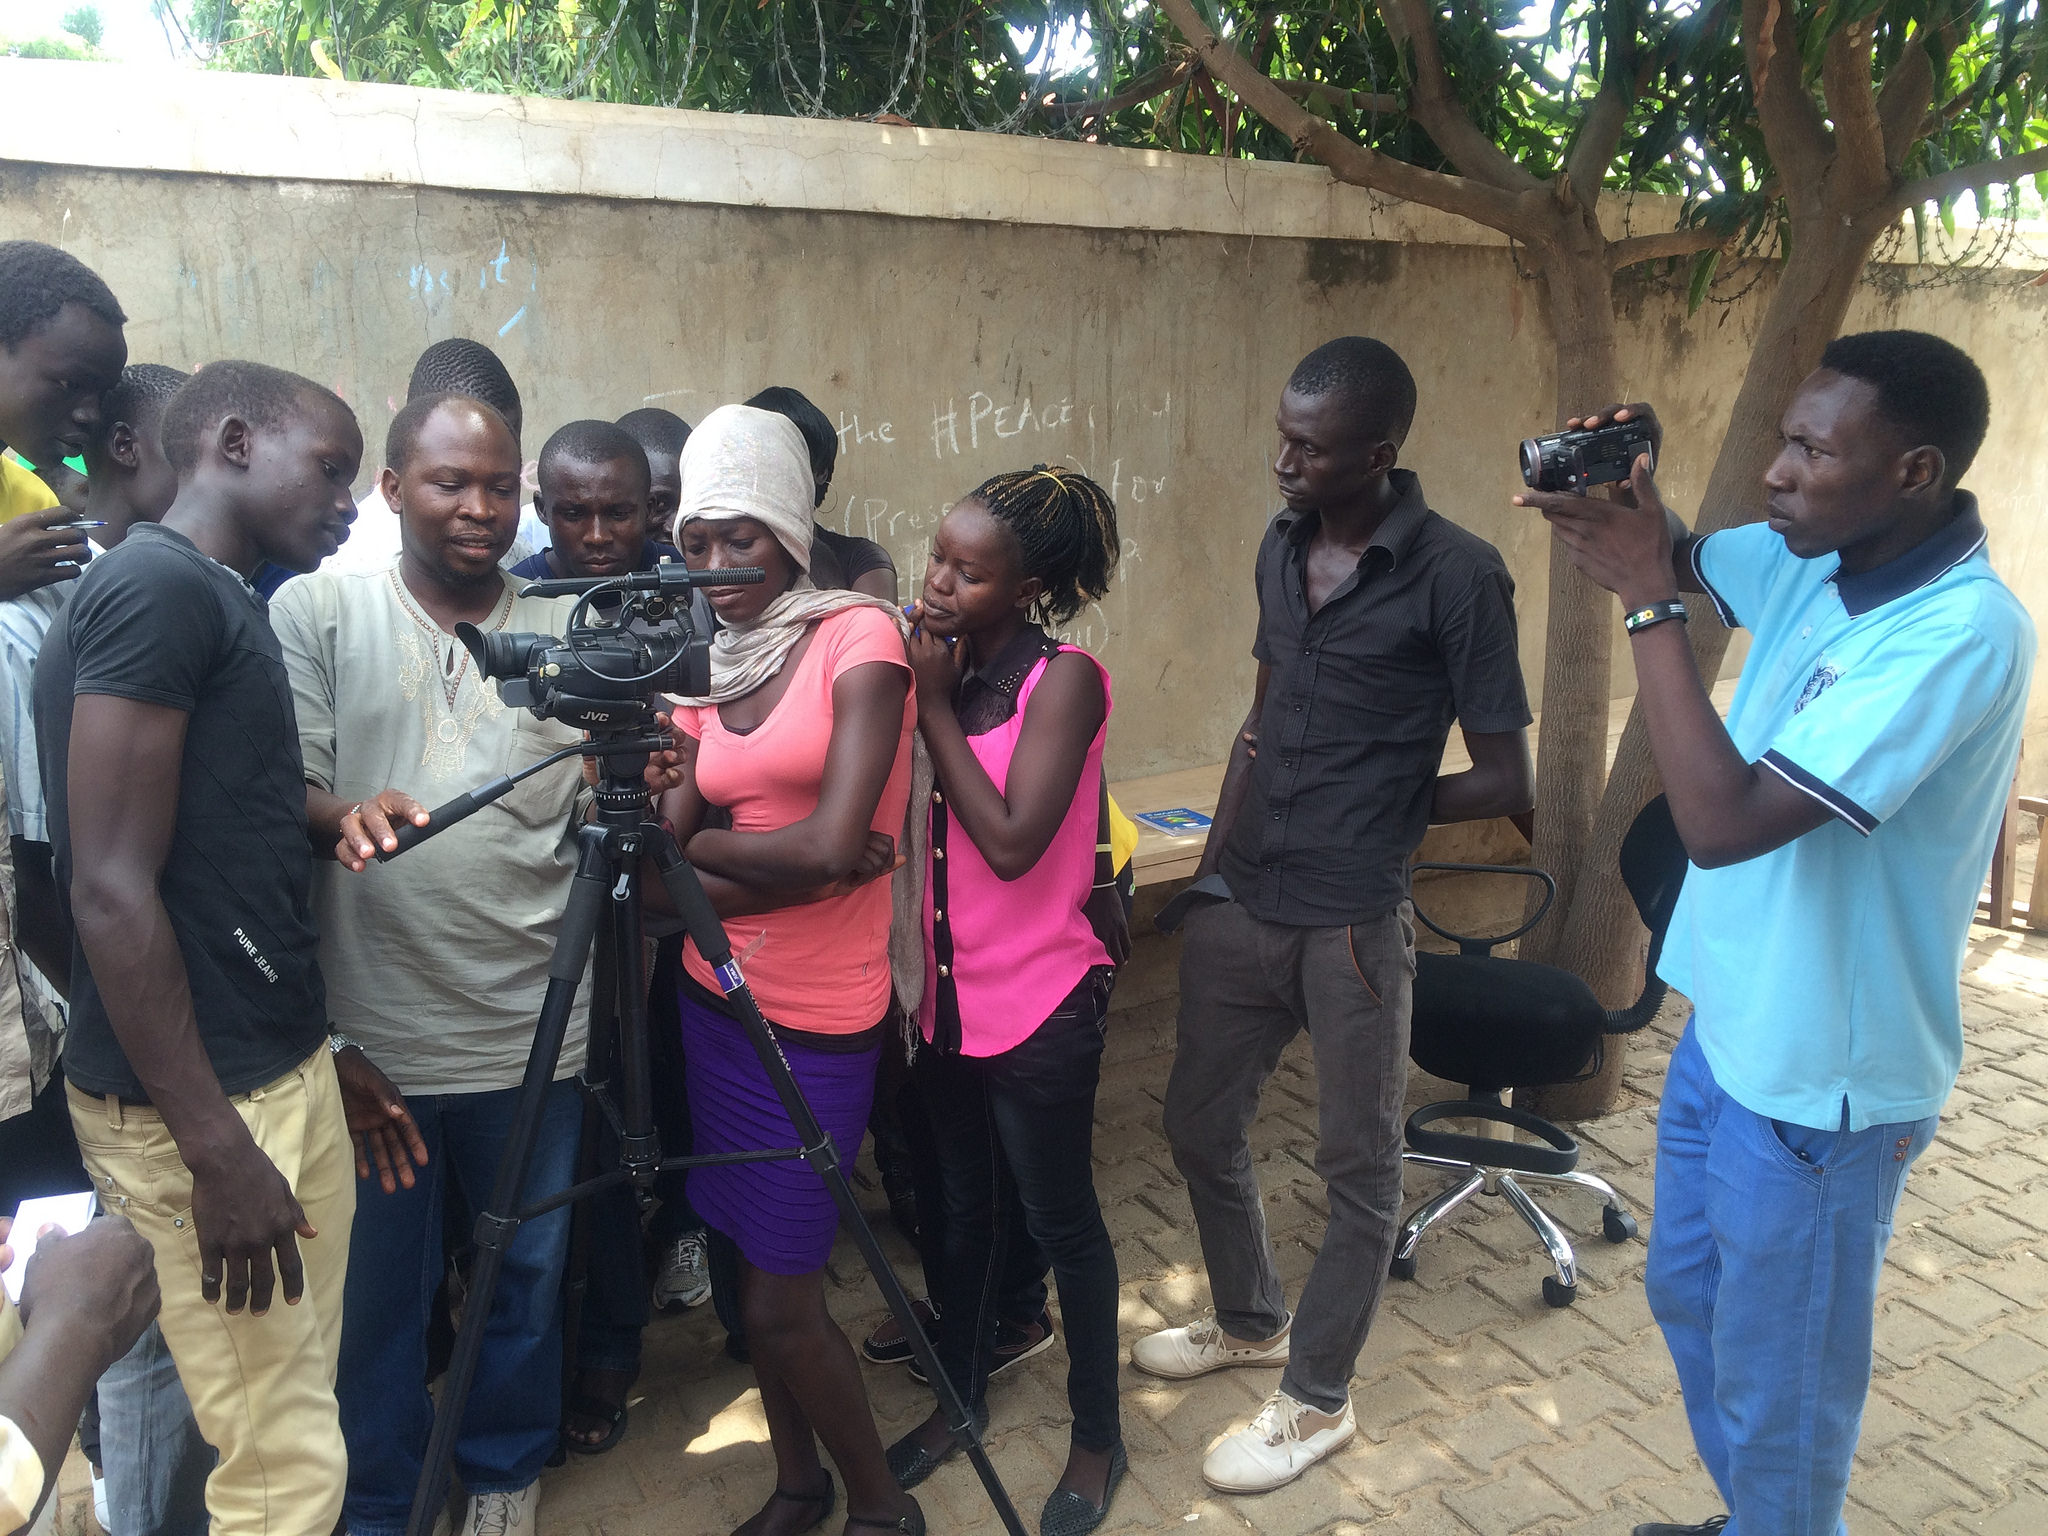 #southsudan #peacehackcamp